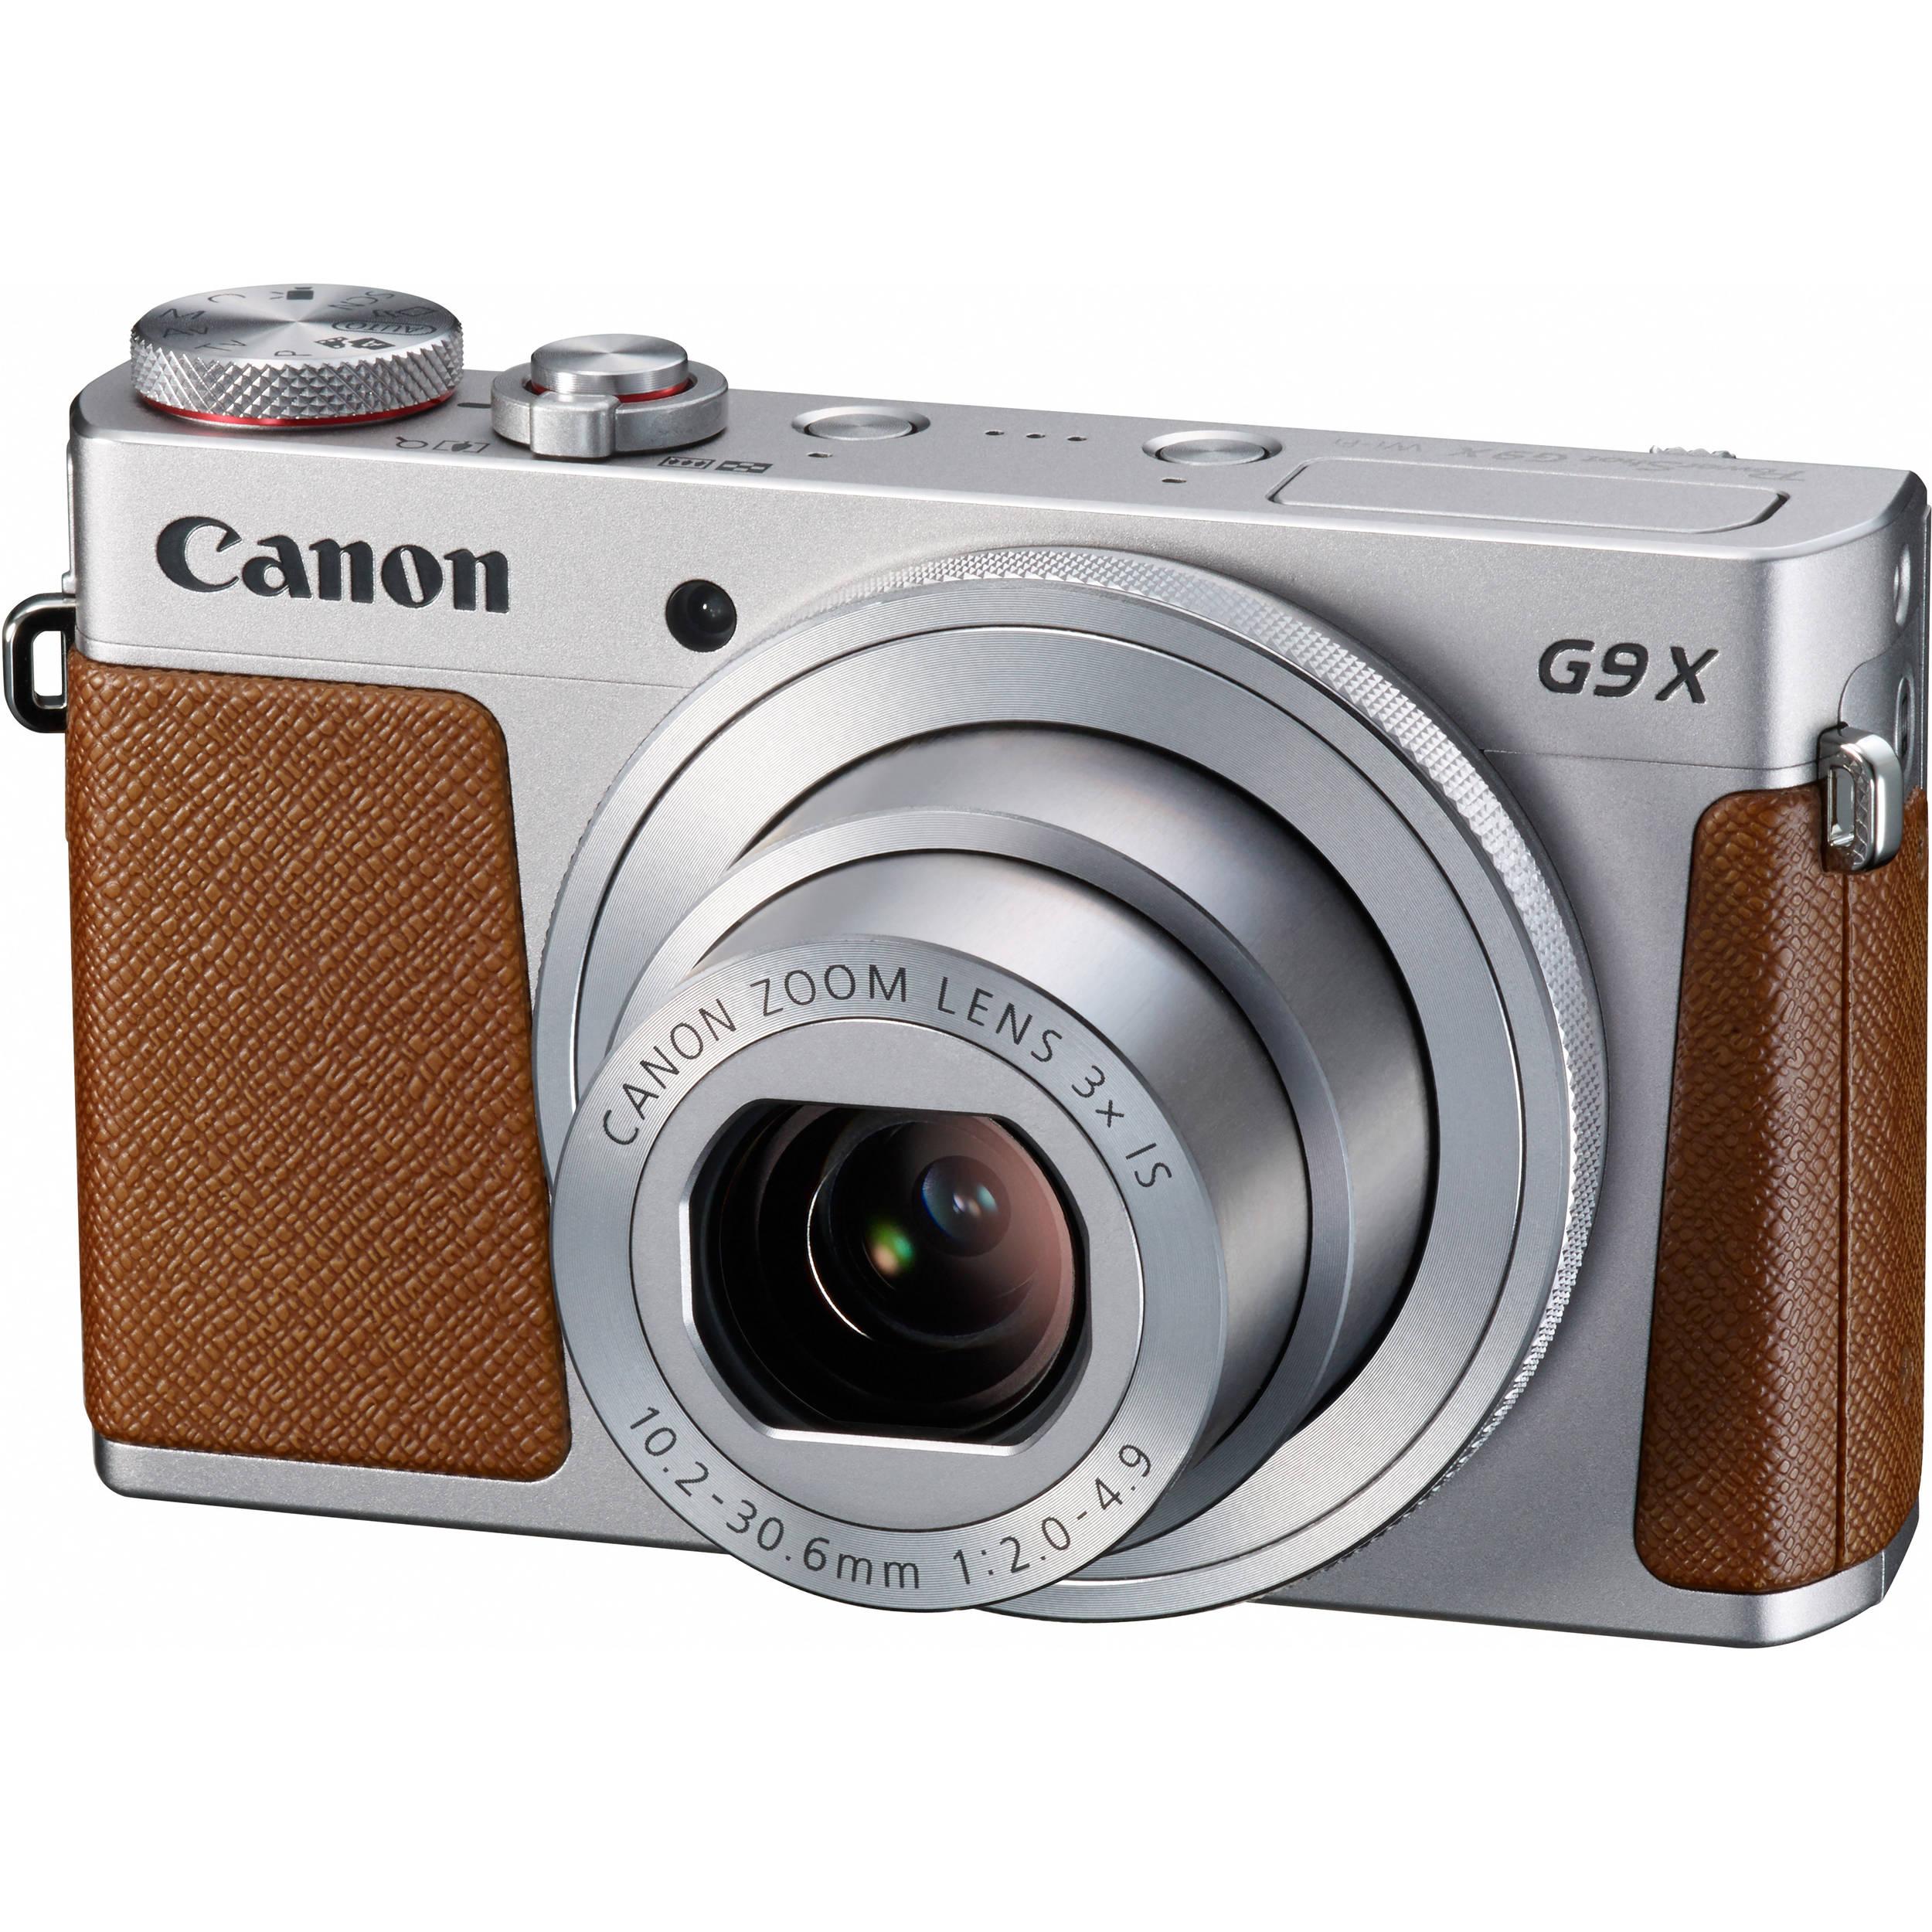 Canon PowerShot G9 X Digital Camera (Silver) 0924C001 B&H Photo